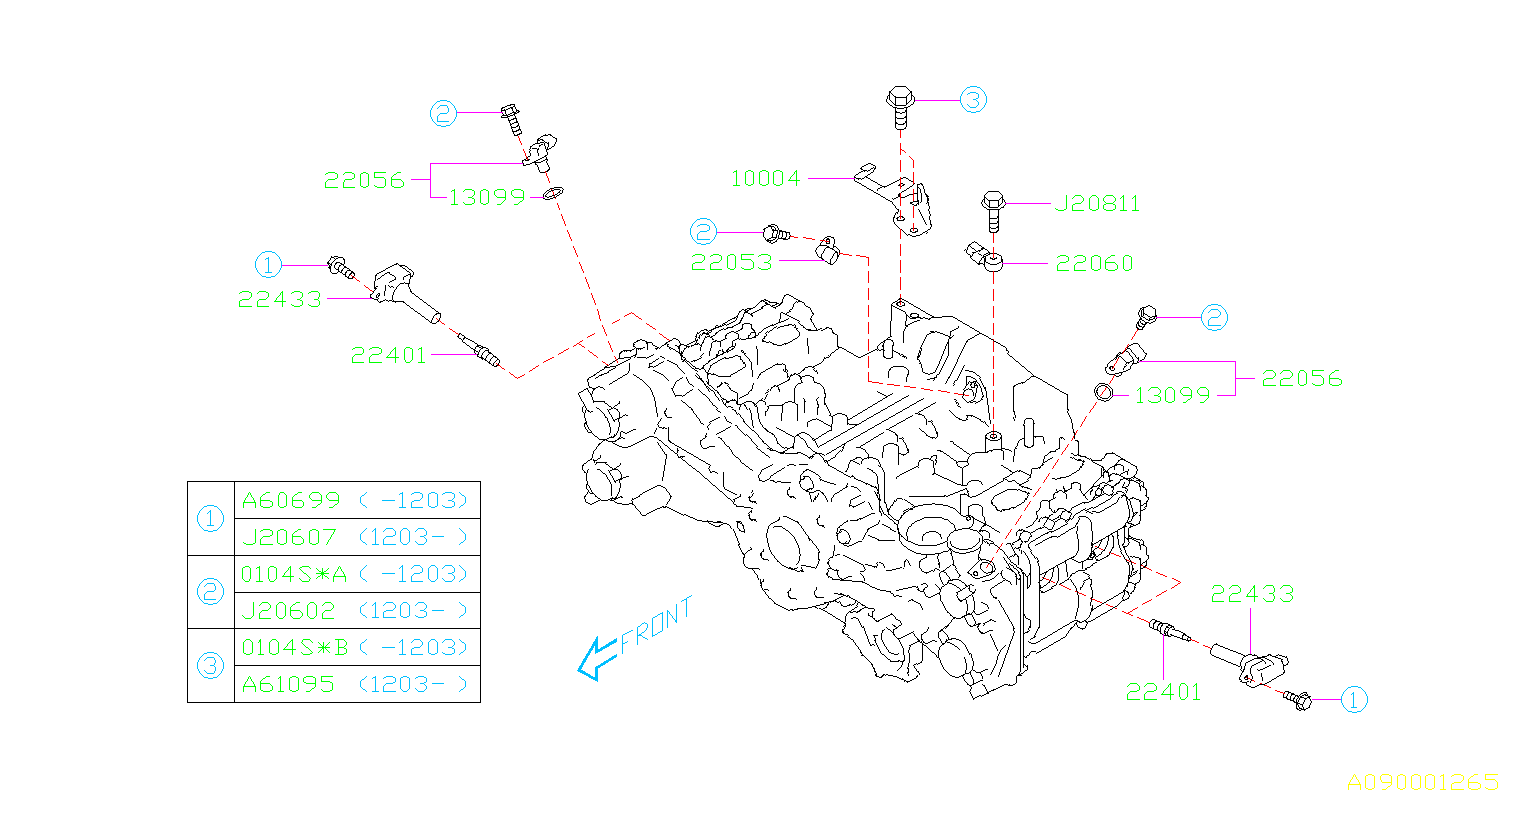 Subaru Forester Bolt  Bolt 10x20x20  Tension  Spark  Plug